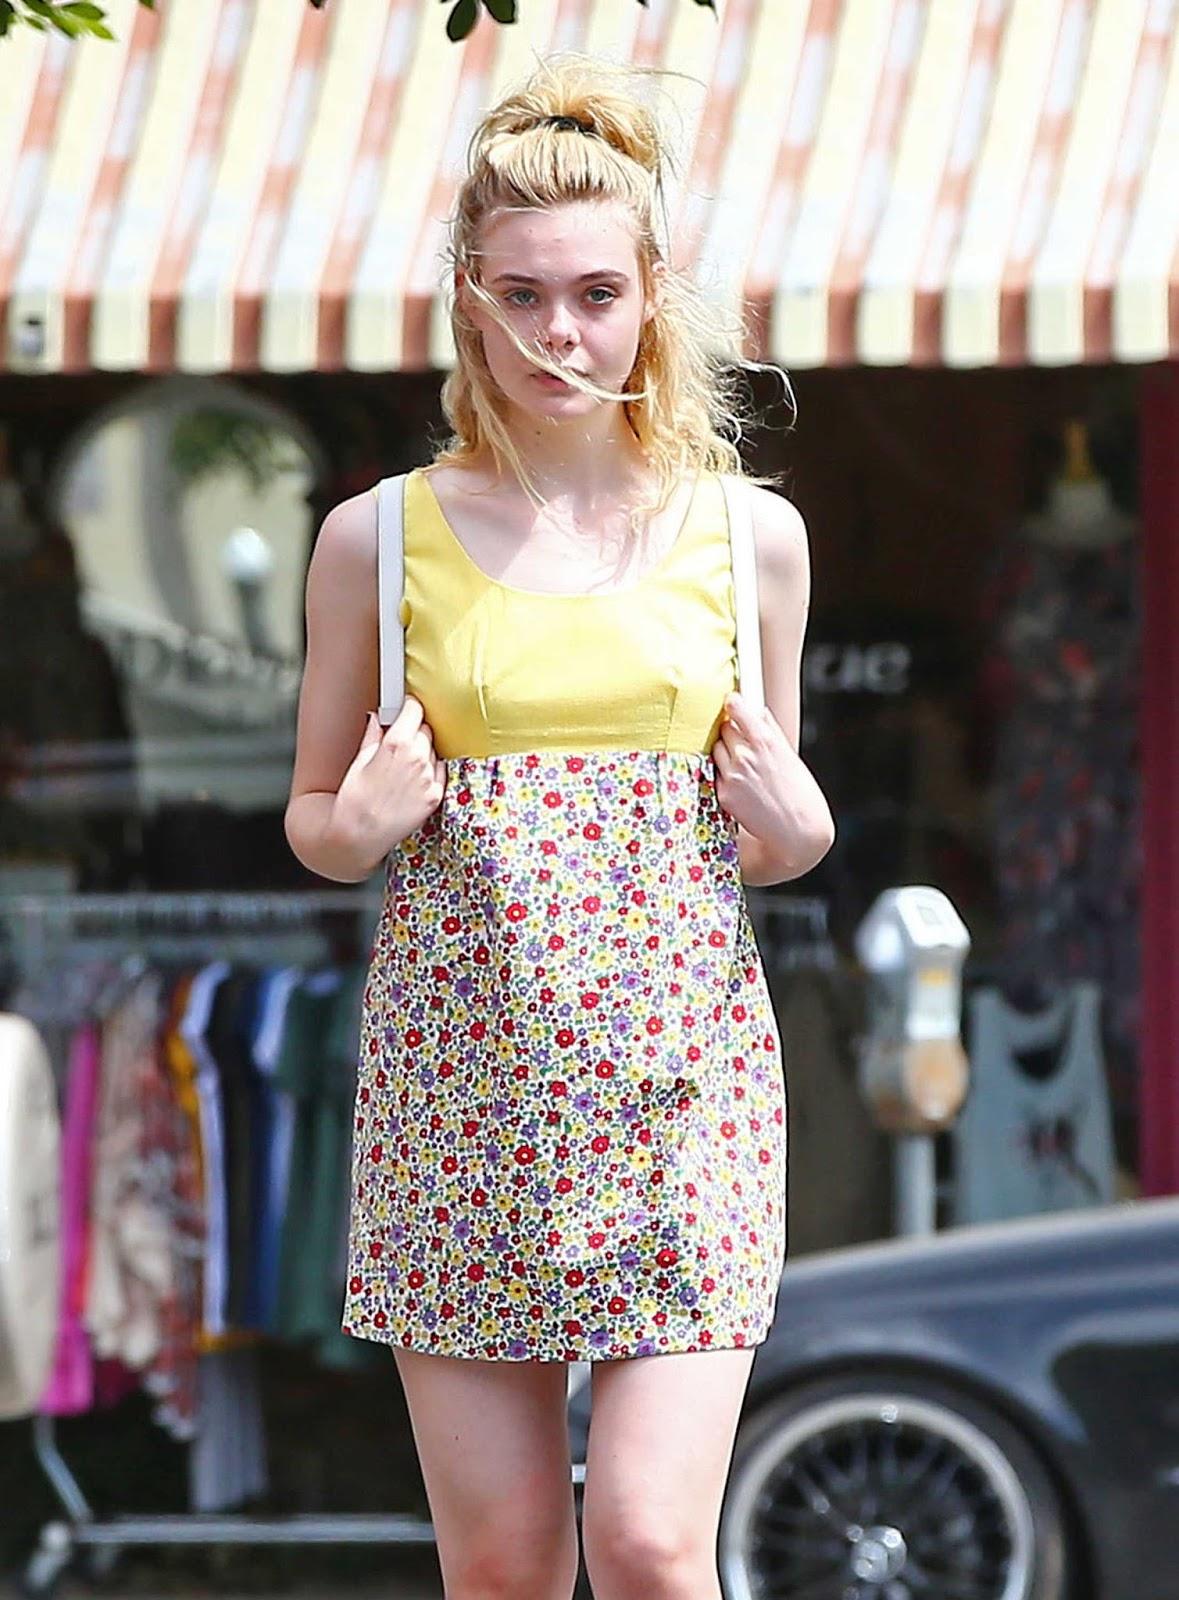 Elle Fanning in a Floral Dress